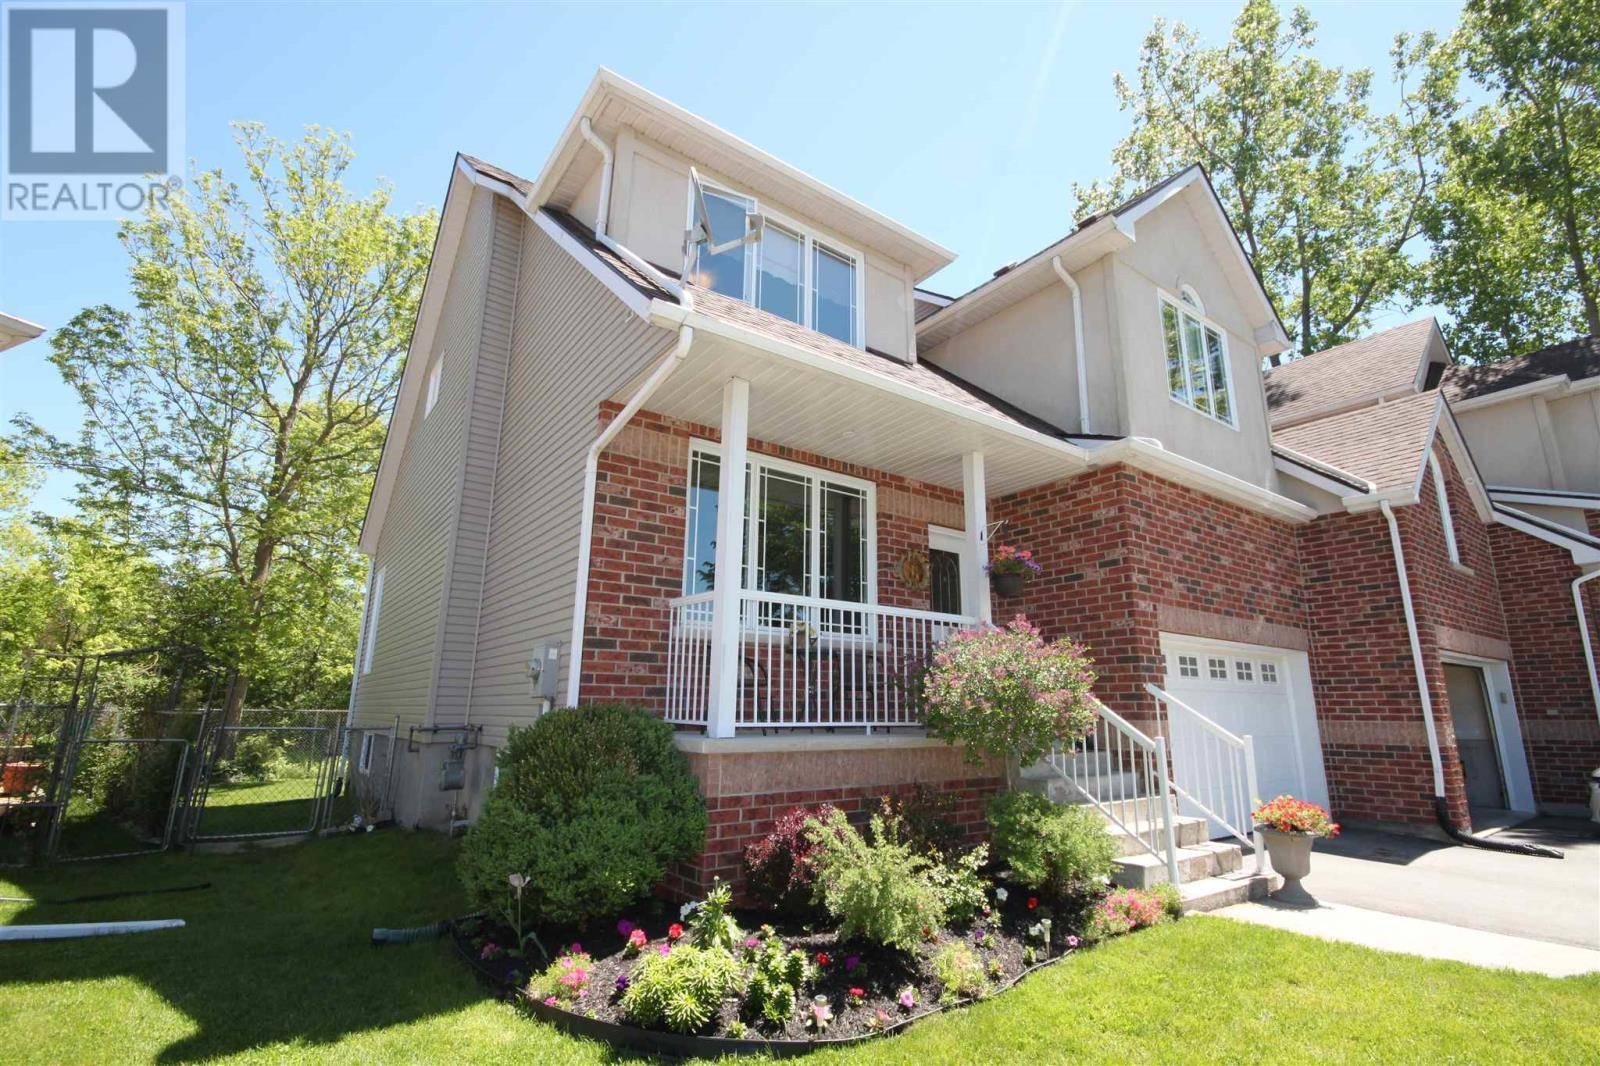 House for sale at 156 Sir John Johnson Dr Bath Ontario - MLS: K19003672